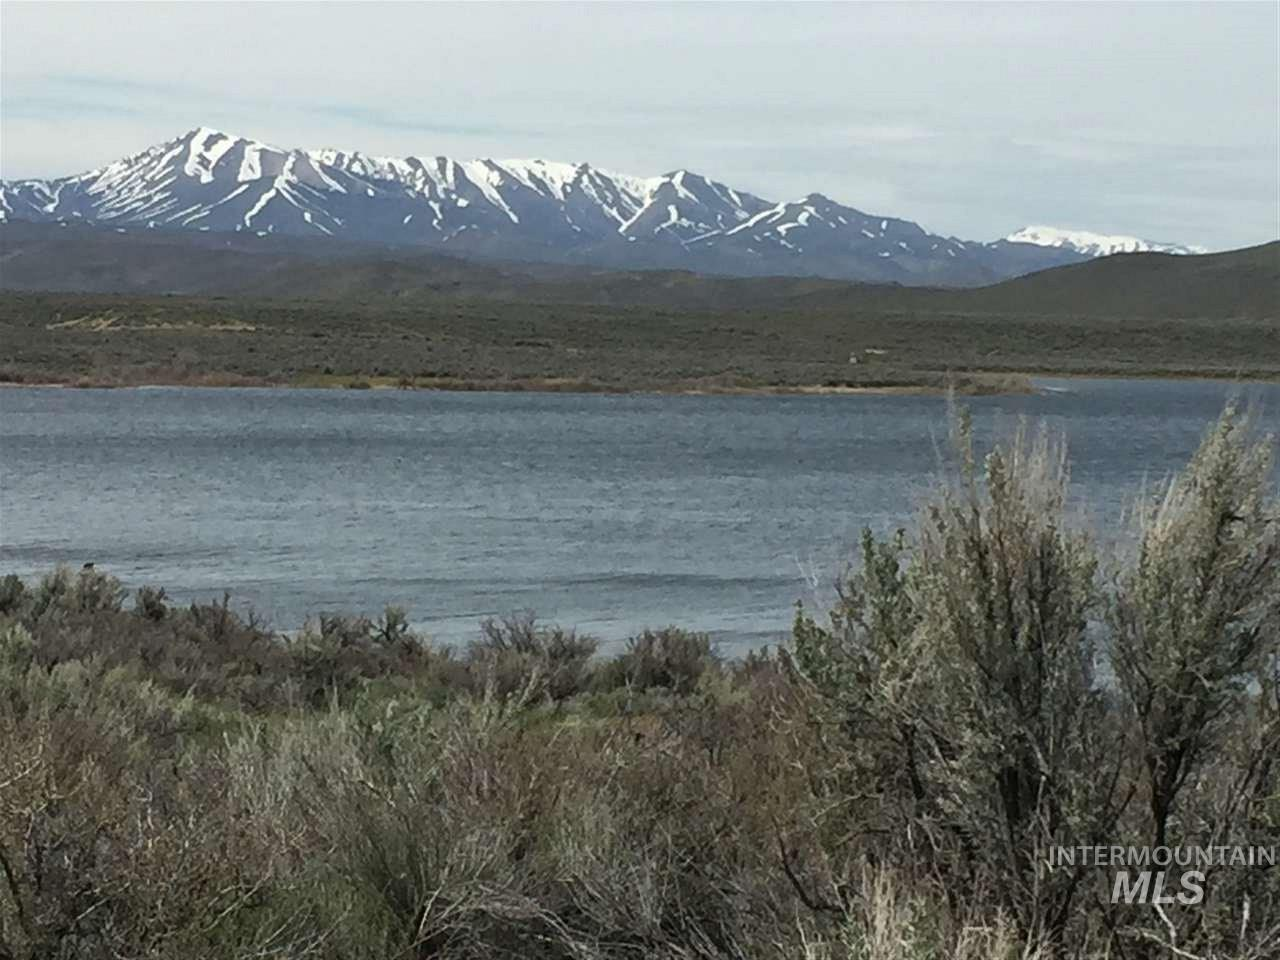 Land for Sale at Tbd Magic Dr West Magic, Idaho 83352